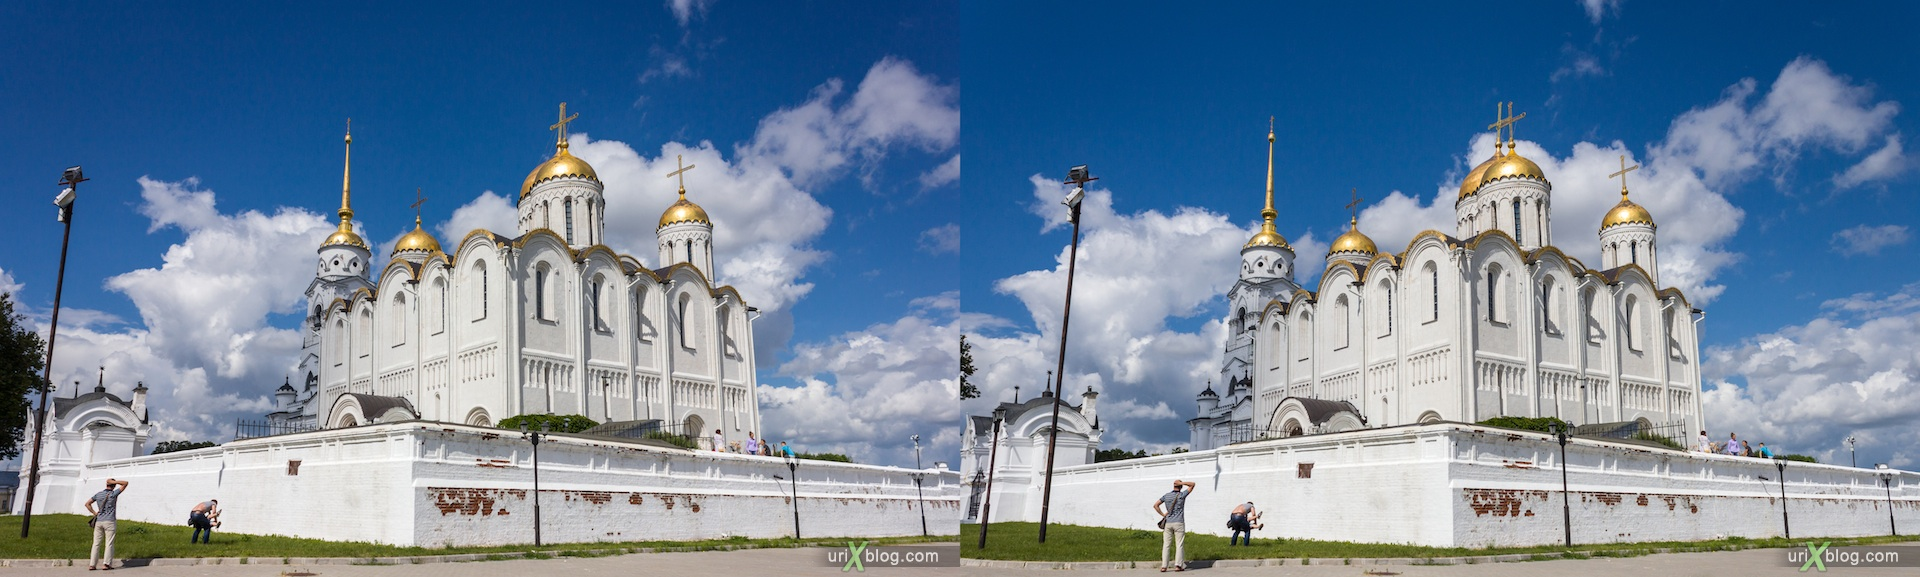 2012 3D stereo stereo pair 3Д стерео церковь храм монастырь владимир Успенский собор, Church Vladimir